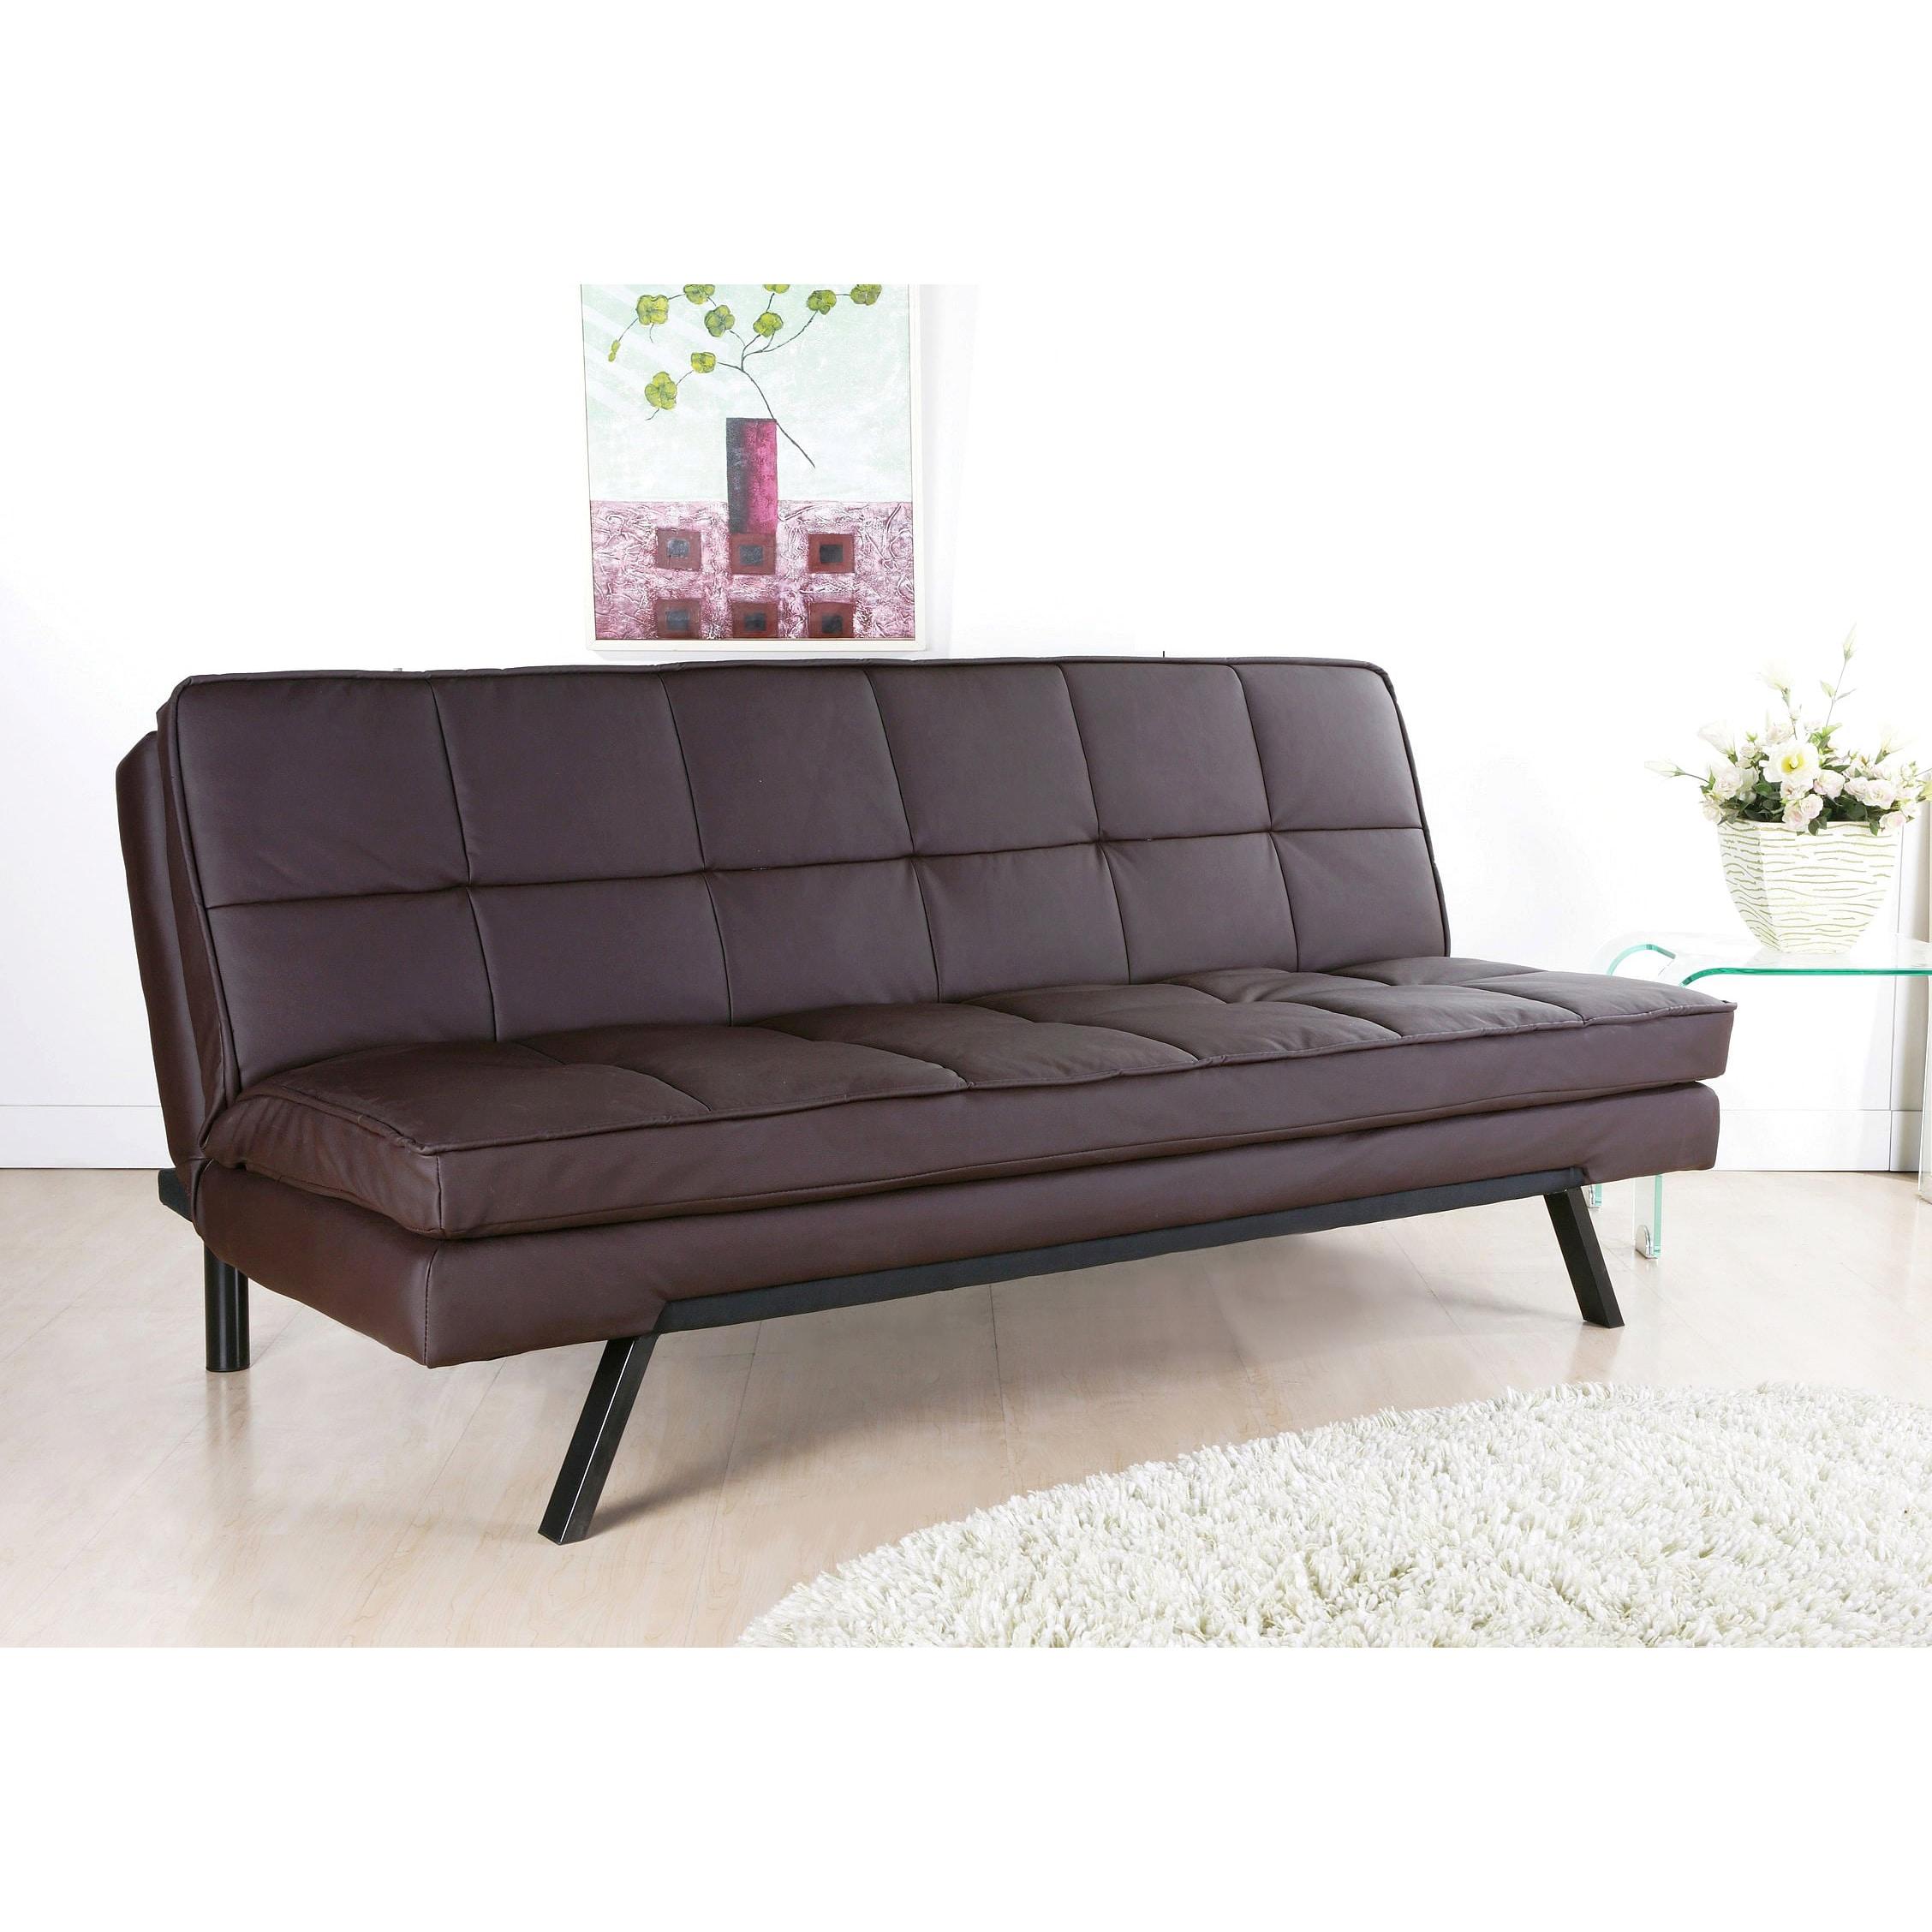 Abbyson Newport Faux Leather Futon Sleeper Sofa Free Shipping